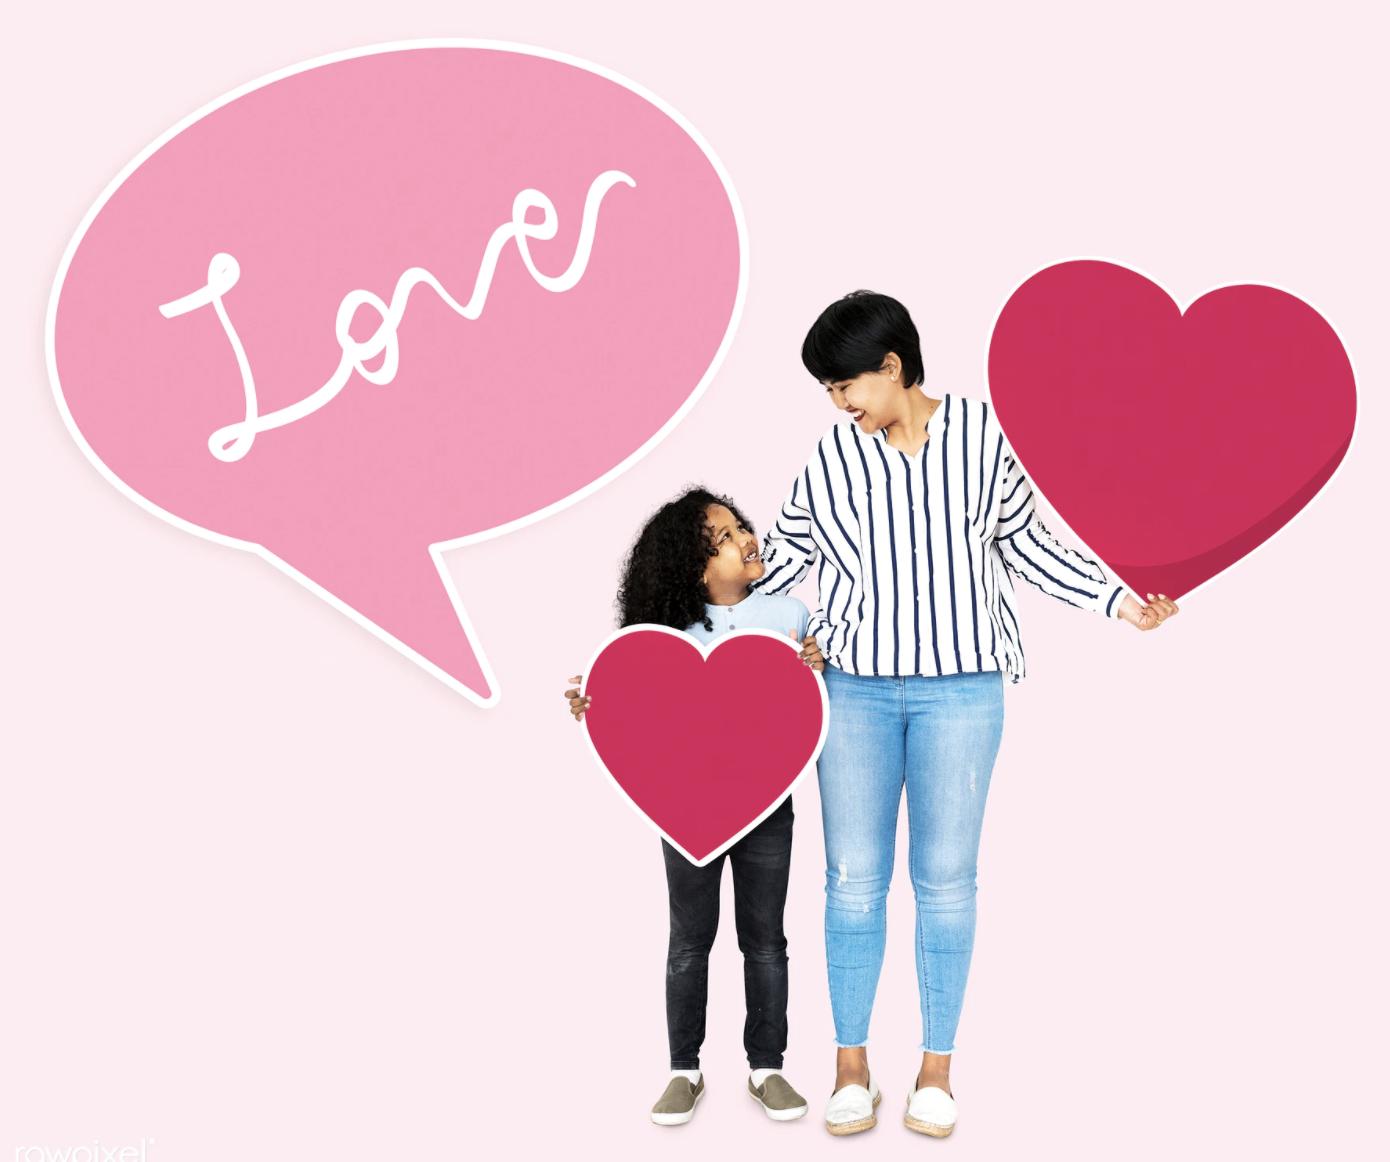 nanny and kid heart oppas guide